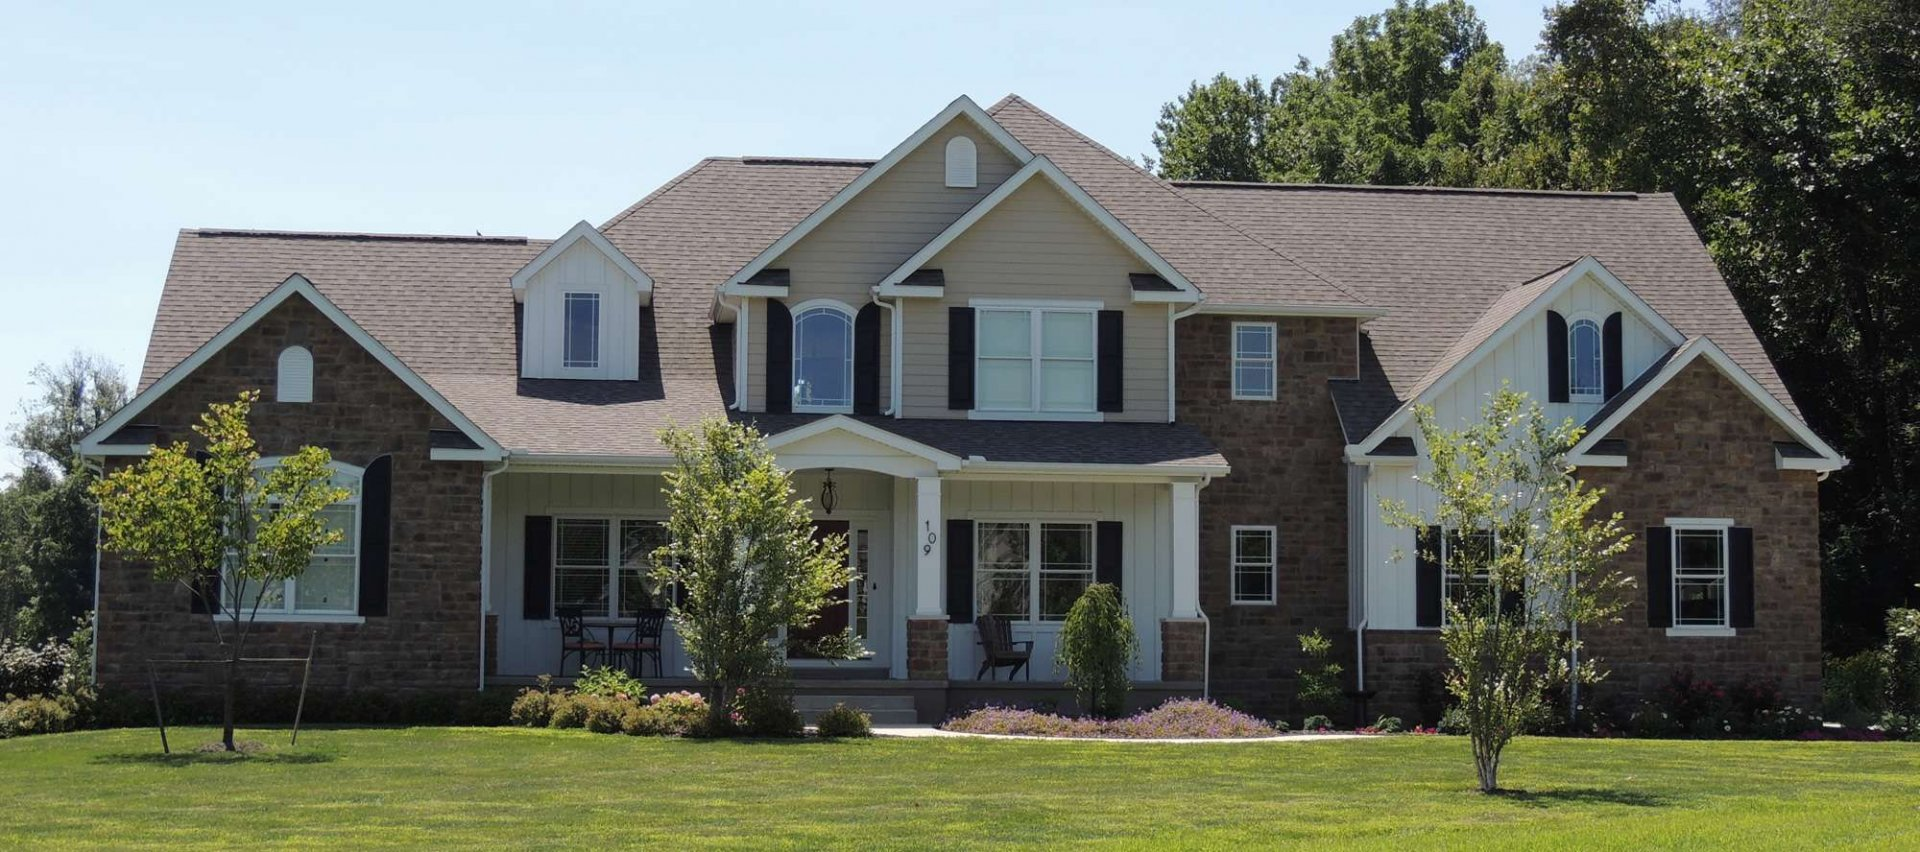 Sell My house Fast Boise , Idaho